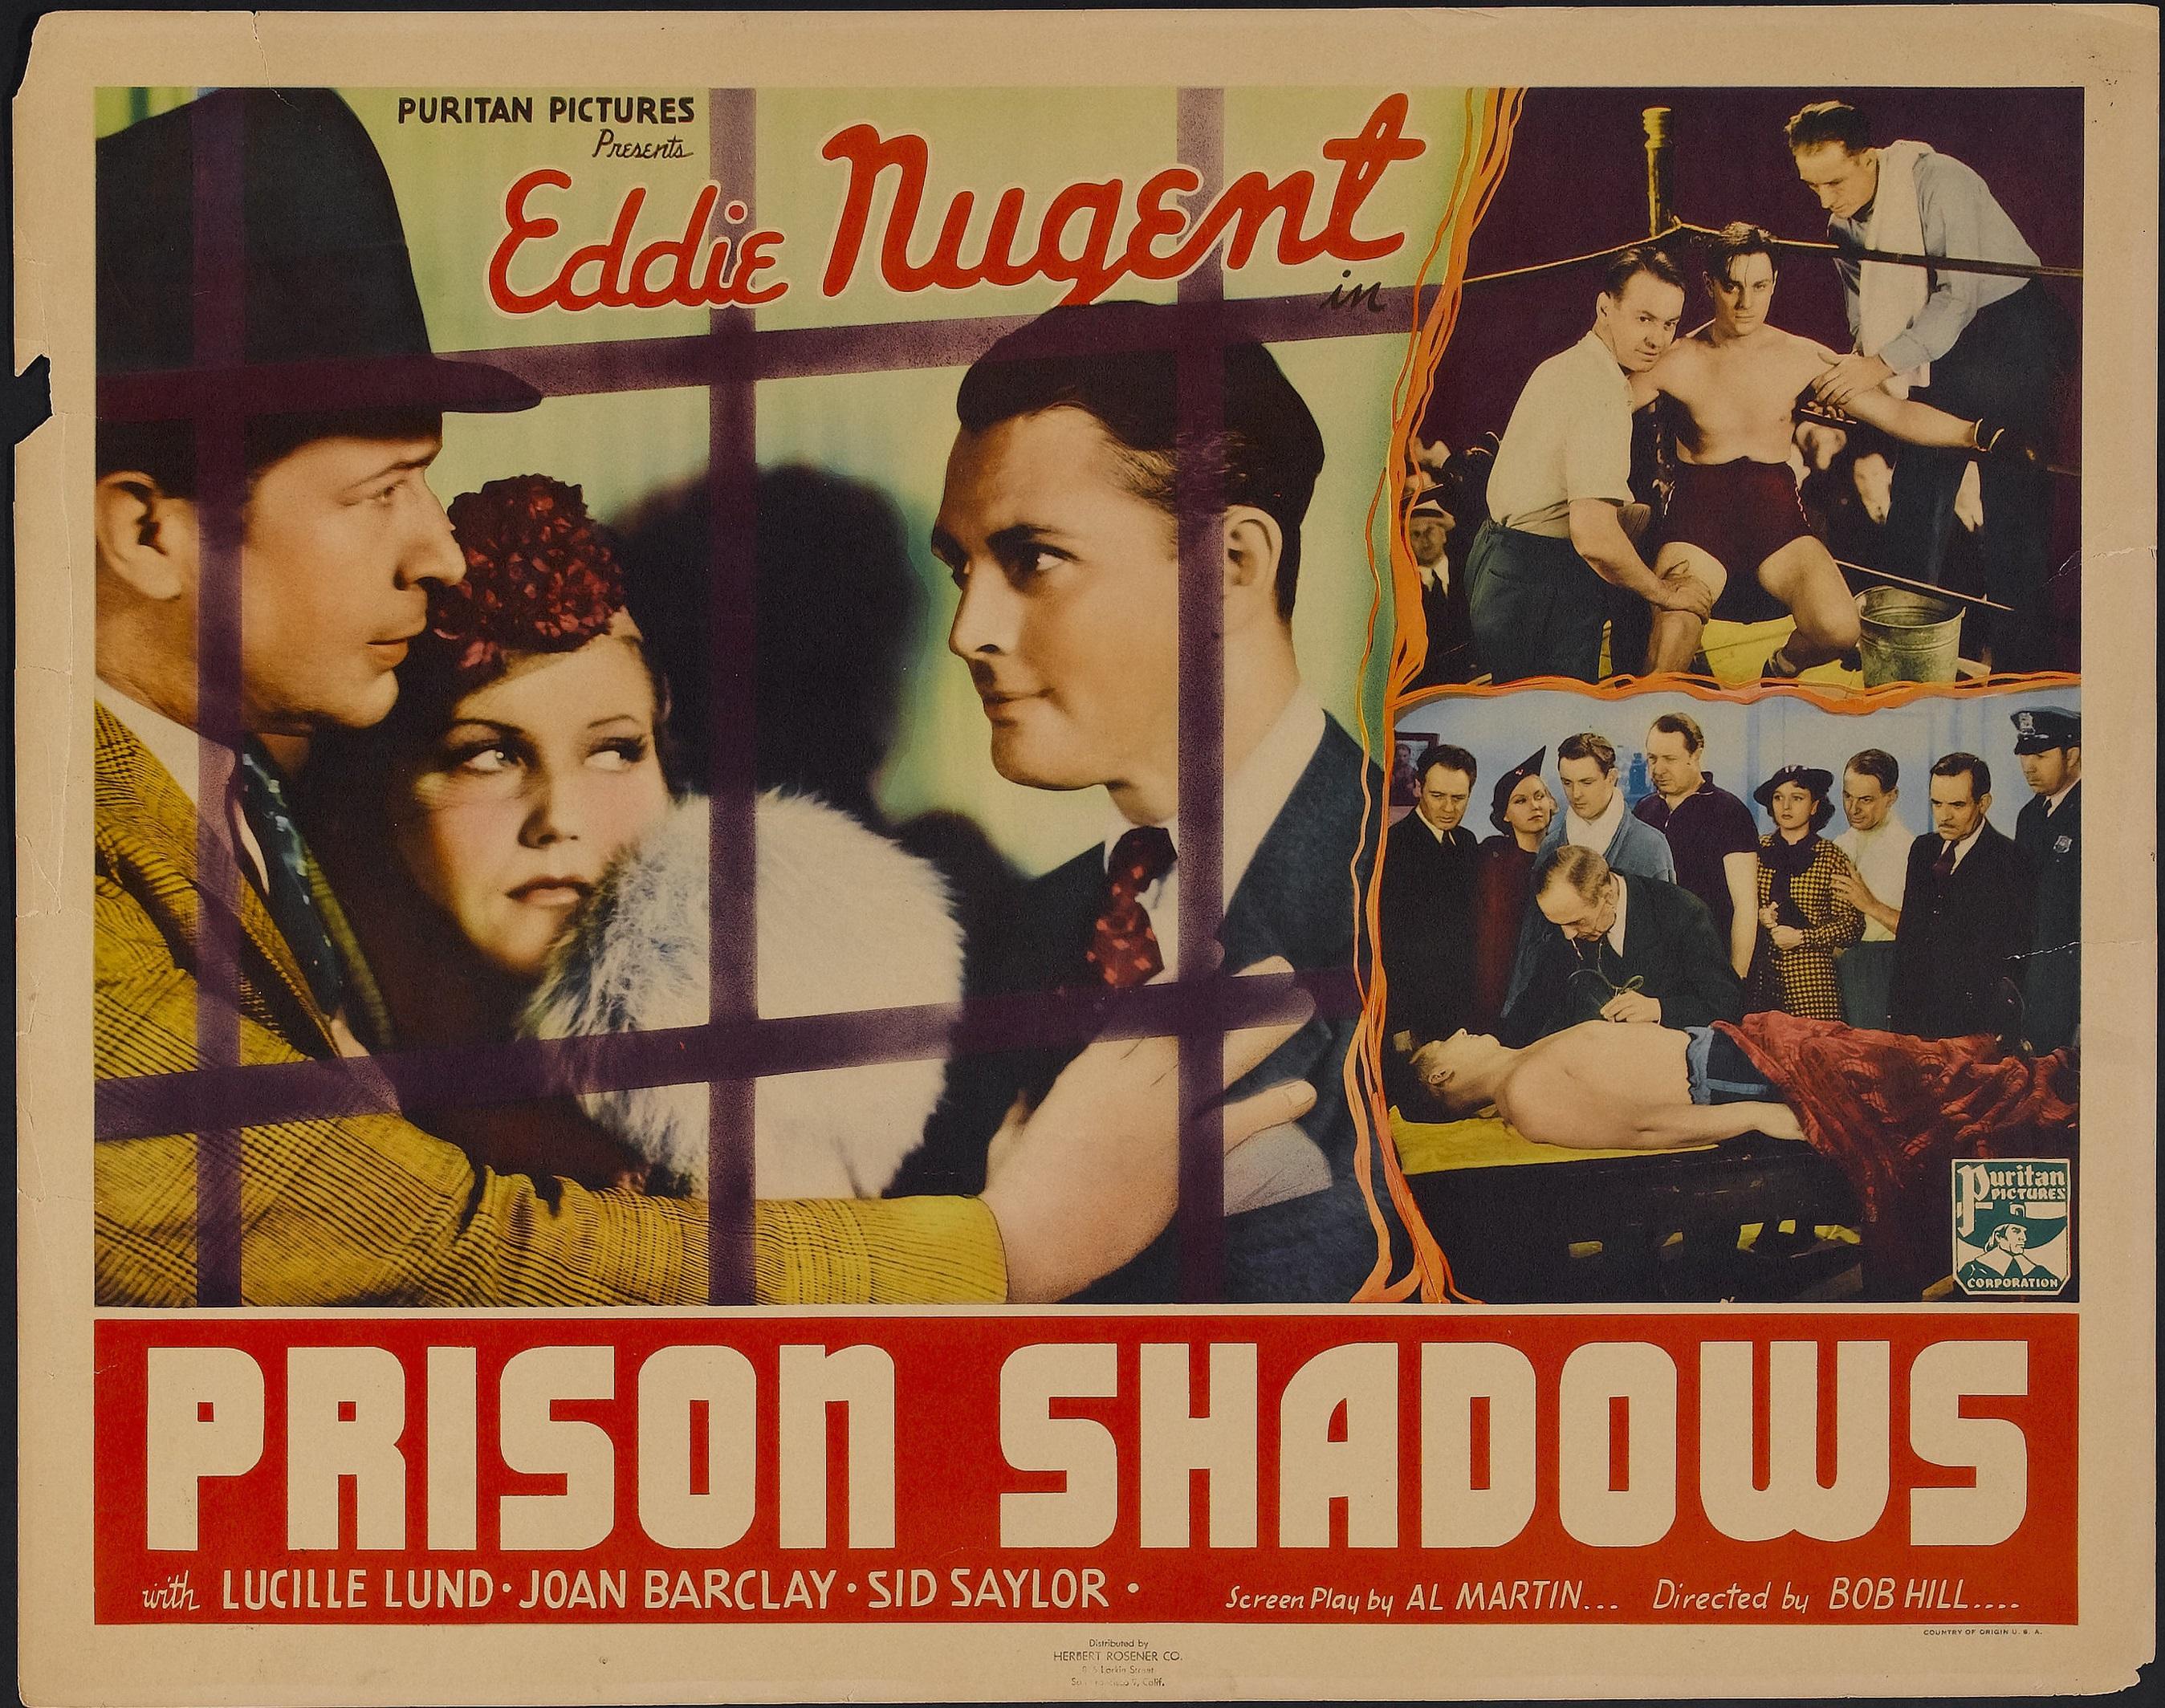 Edward J. Nugent in Prison Shadows (1936)